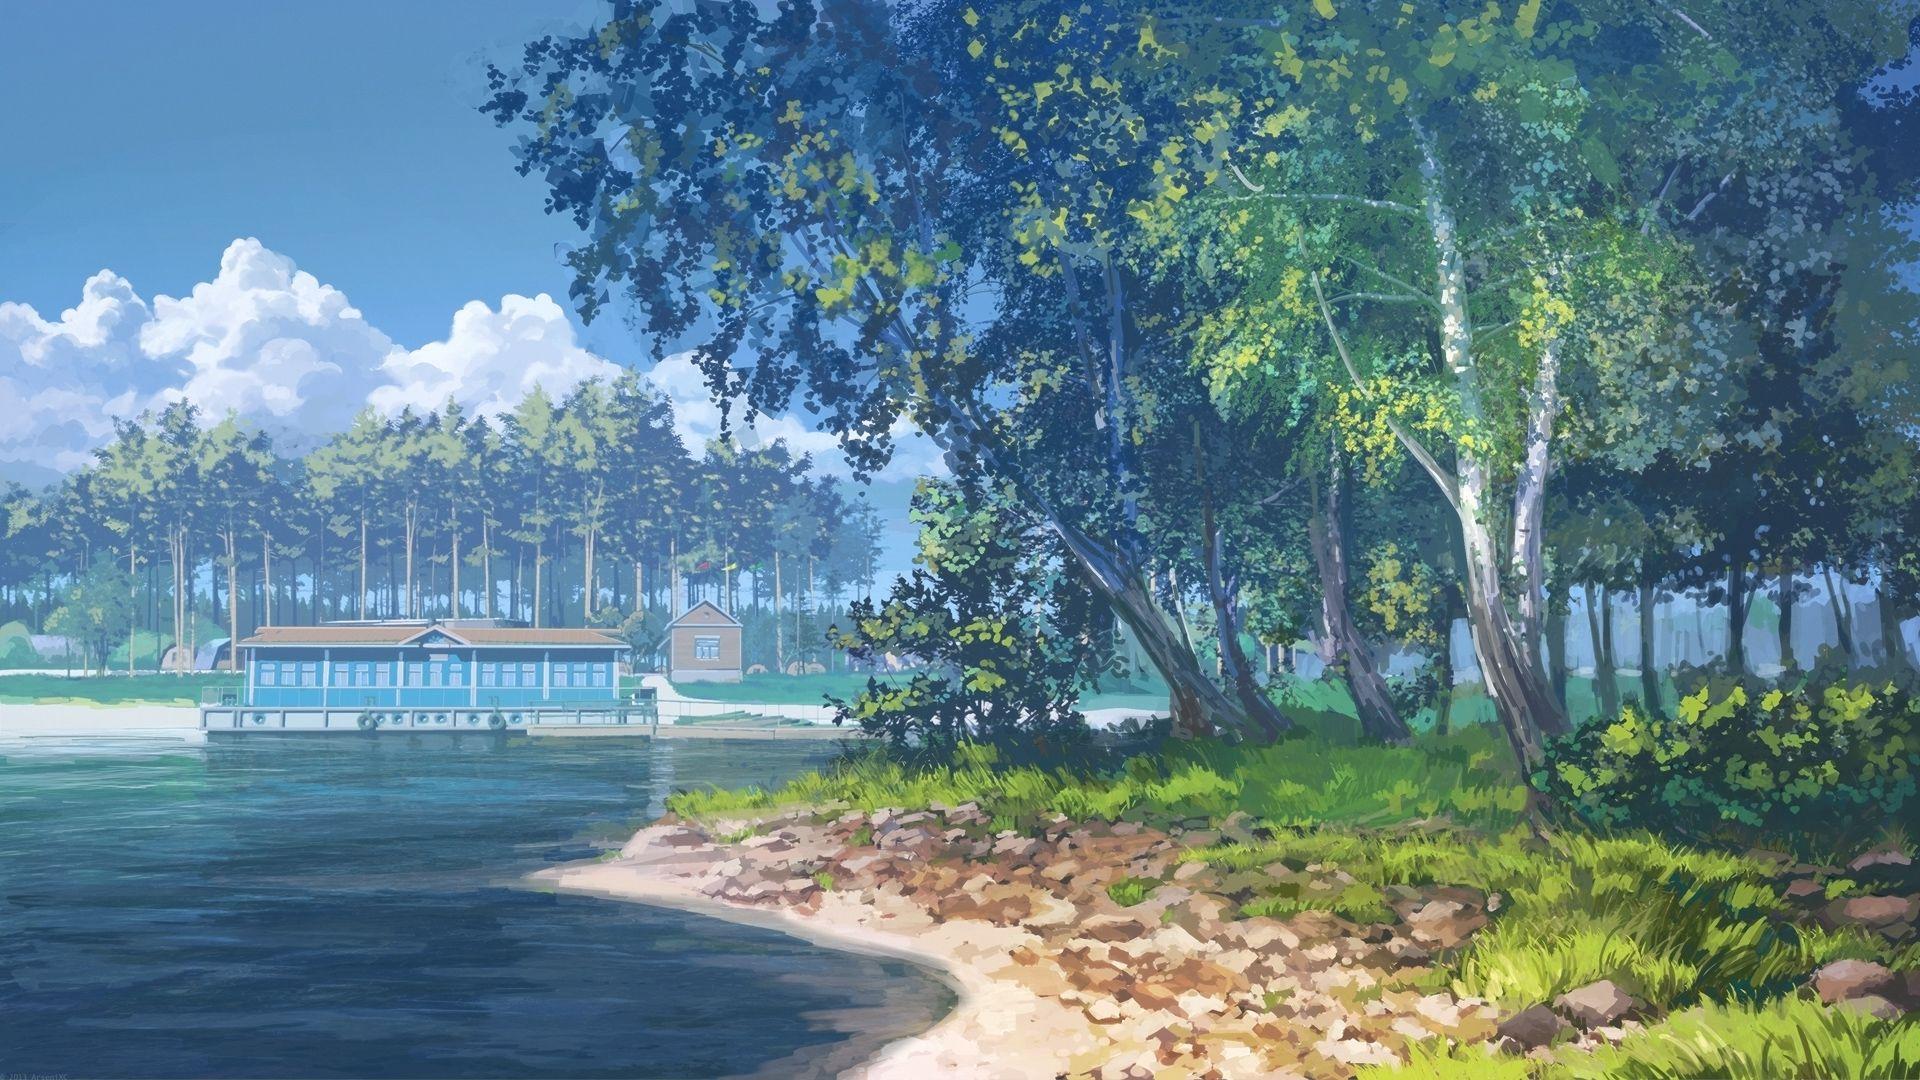 Island Day By Arsenixc Deviantart Com On Deviantart Fundos De